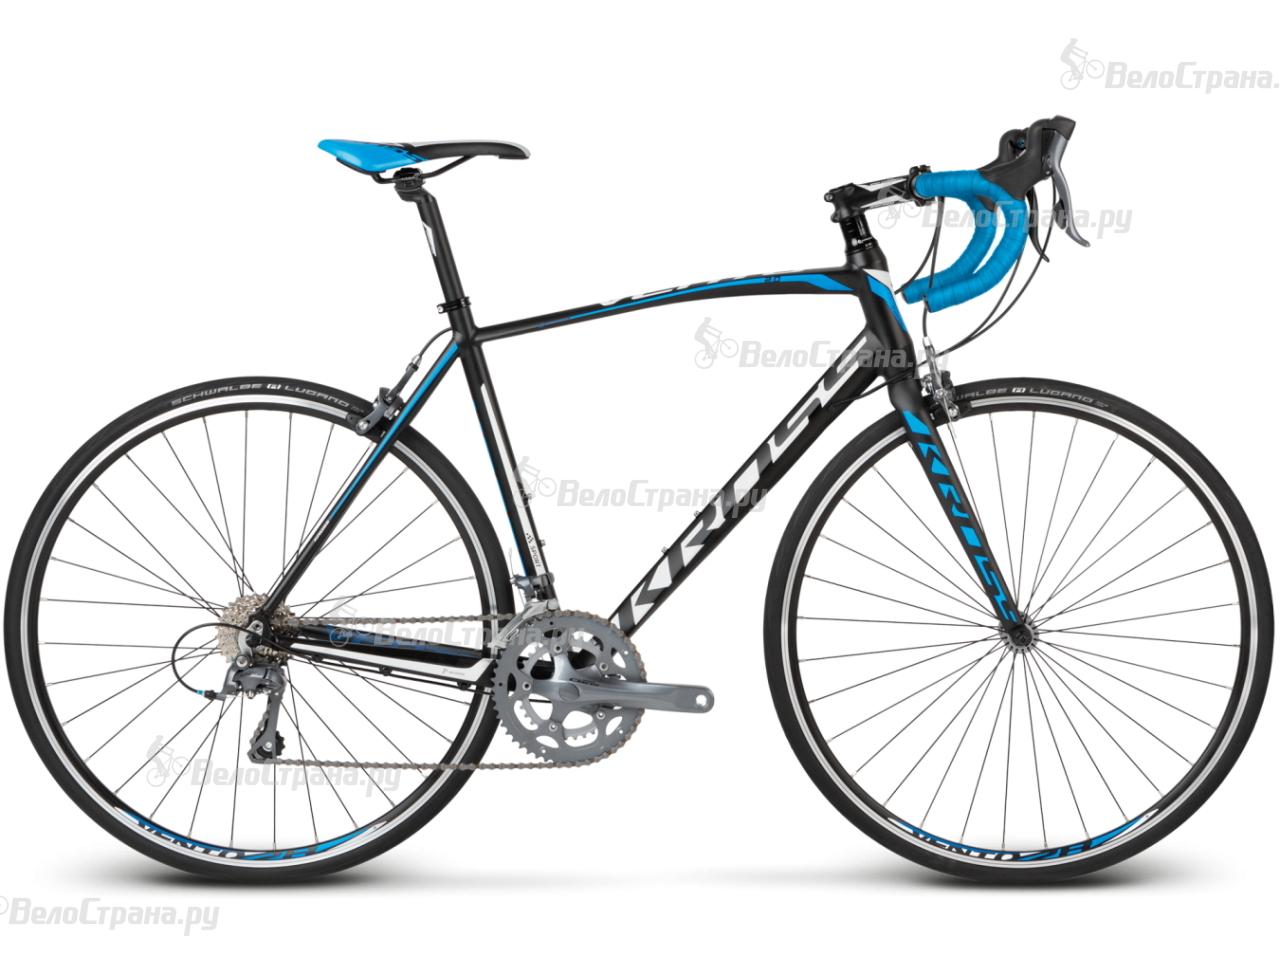 Велосипед Kross VENTO 2.0 (2017) велосипед kross vento 6 0 2017